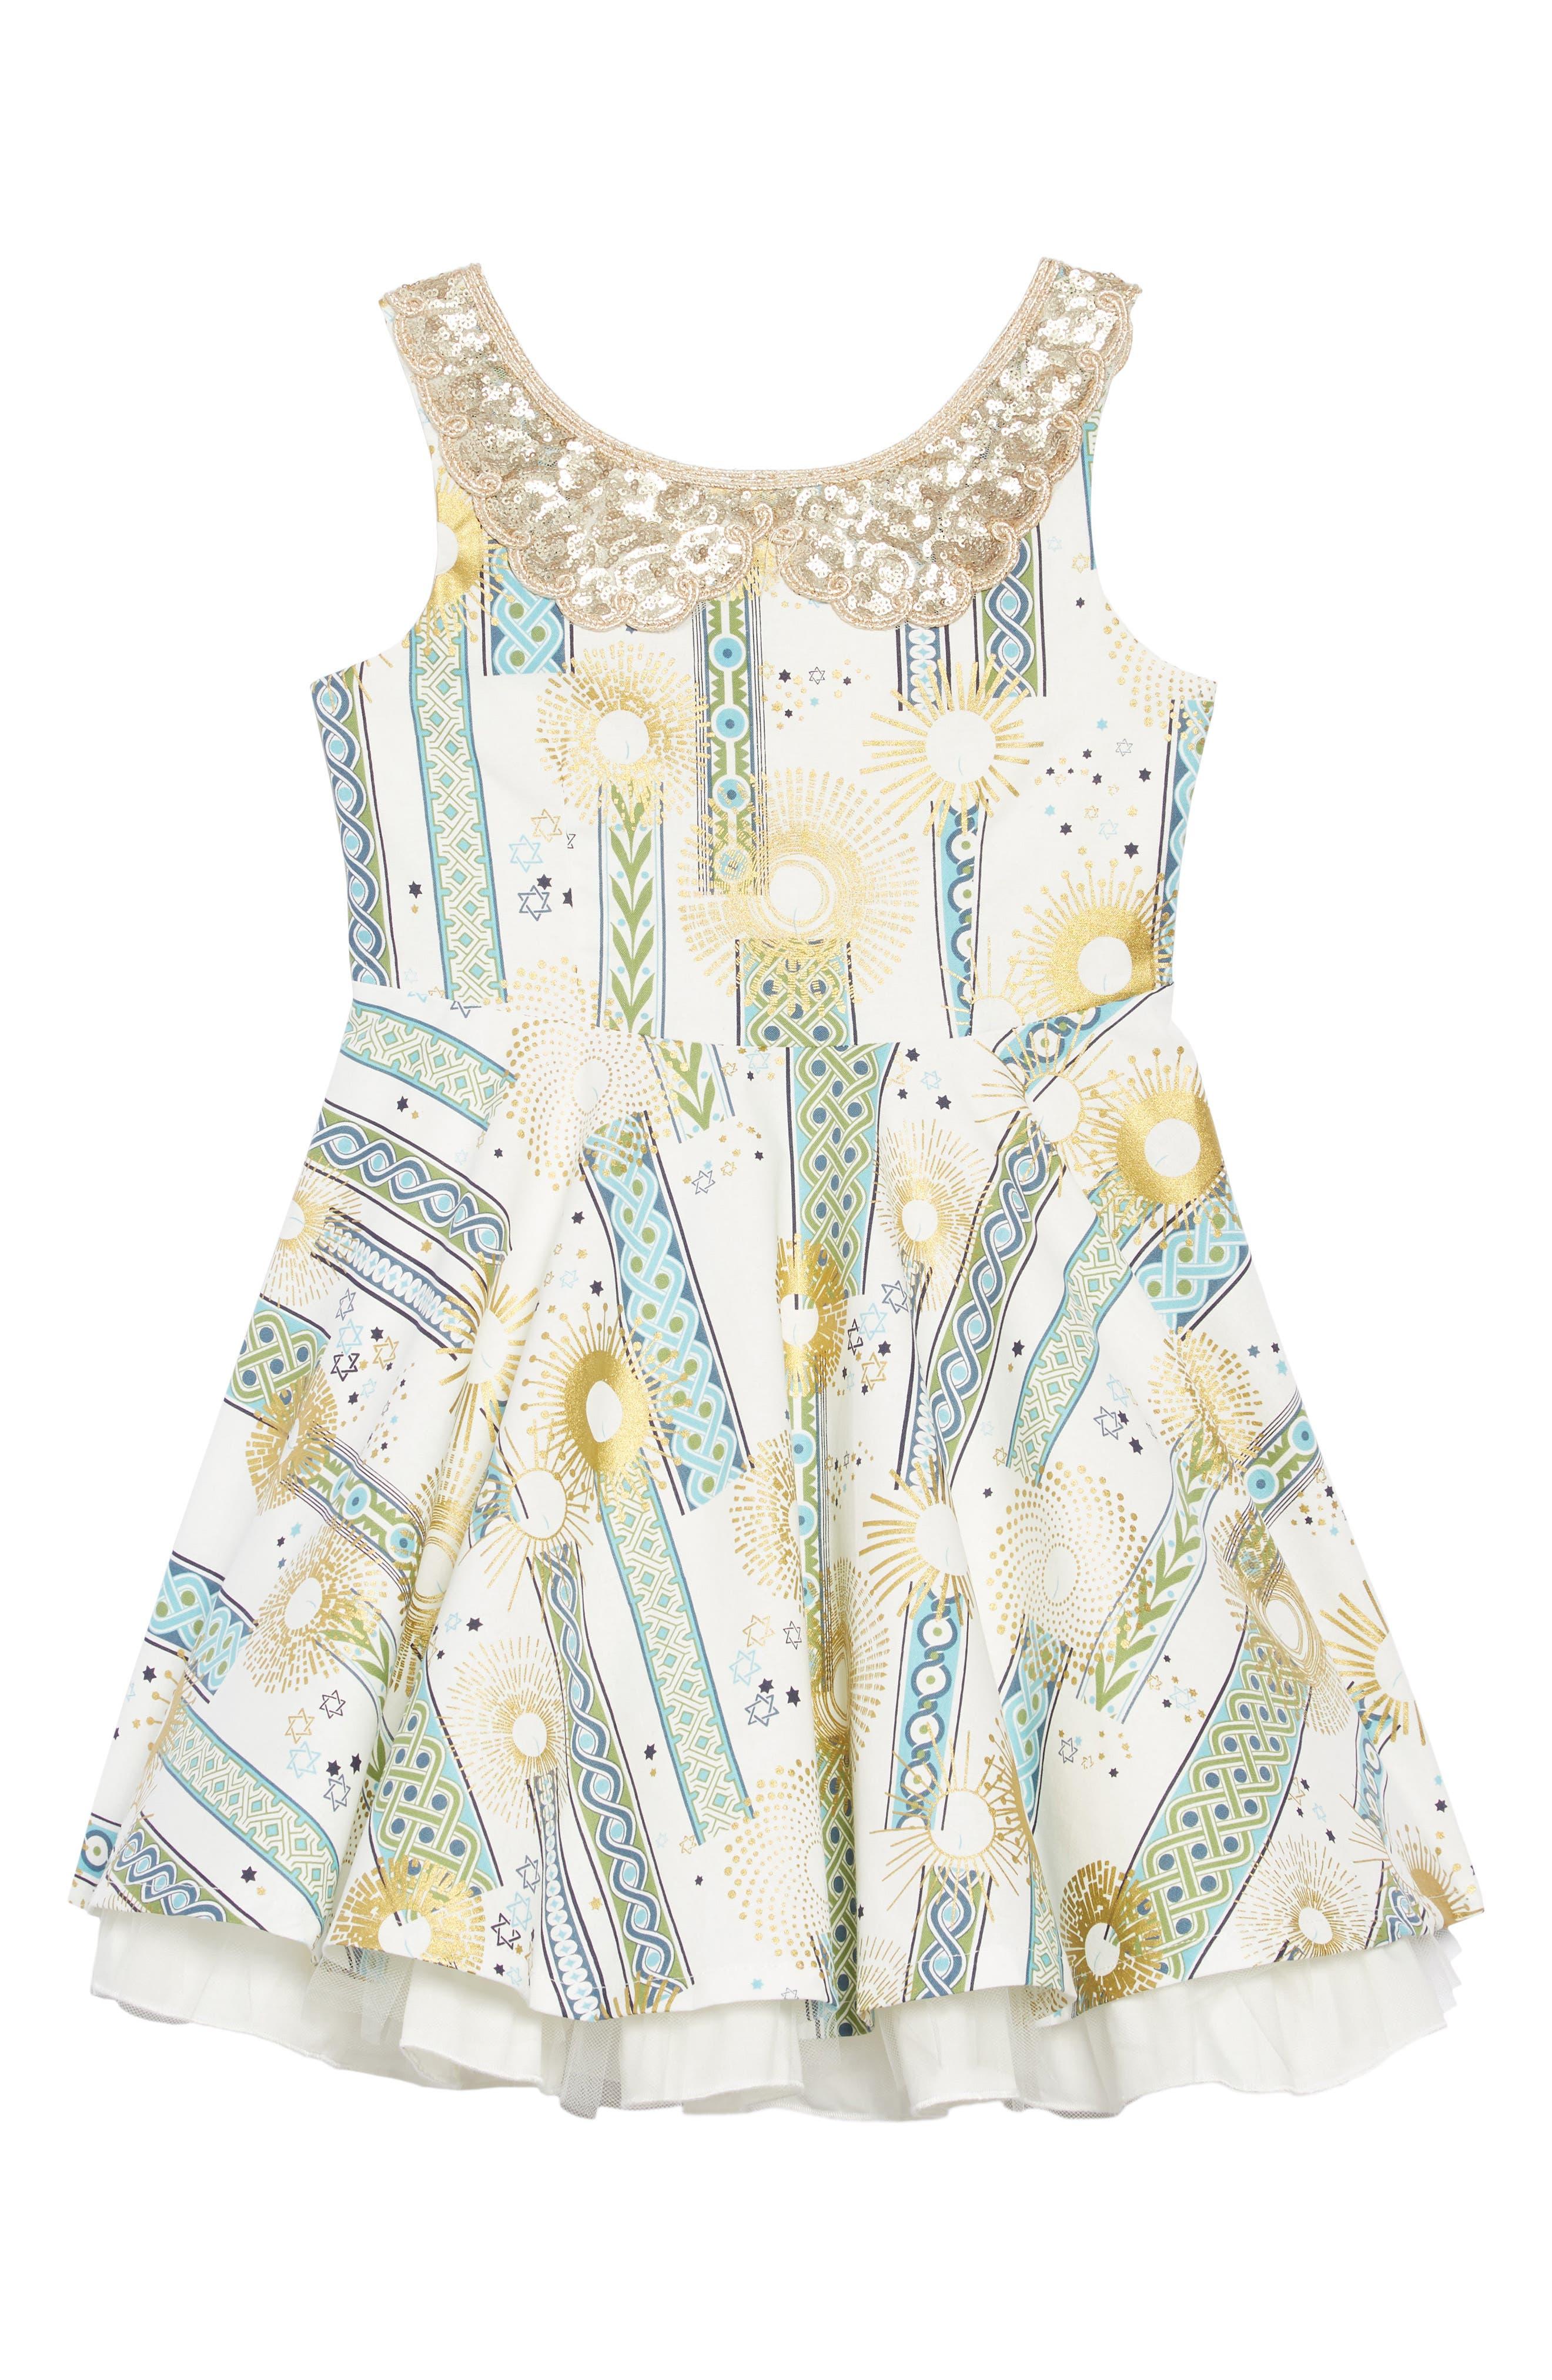 Girls Fiveloaves Twofish Hanukkah Sequin Party Dress